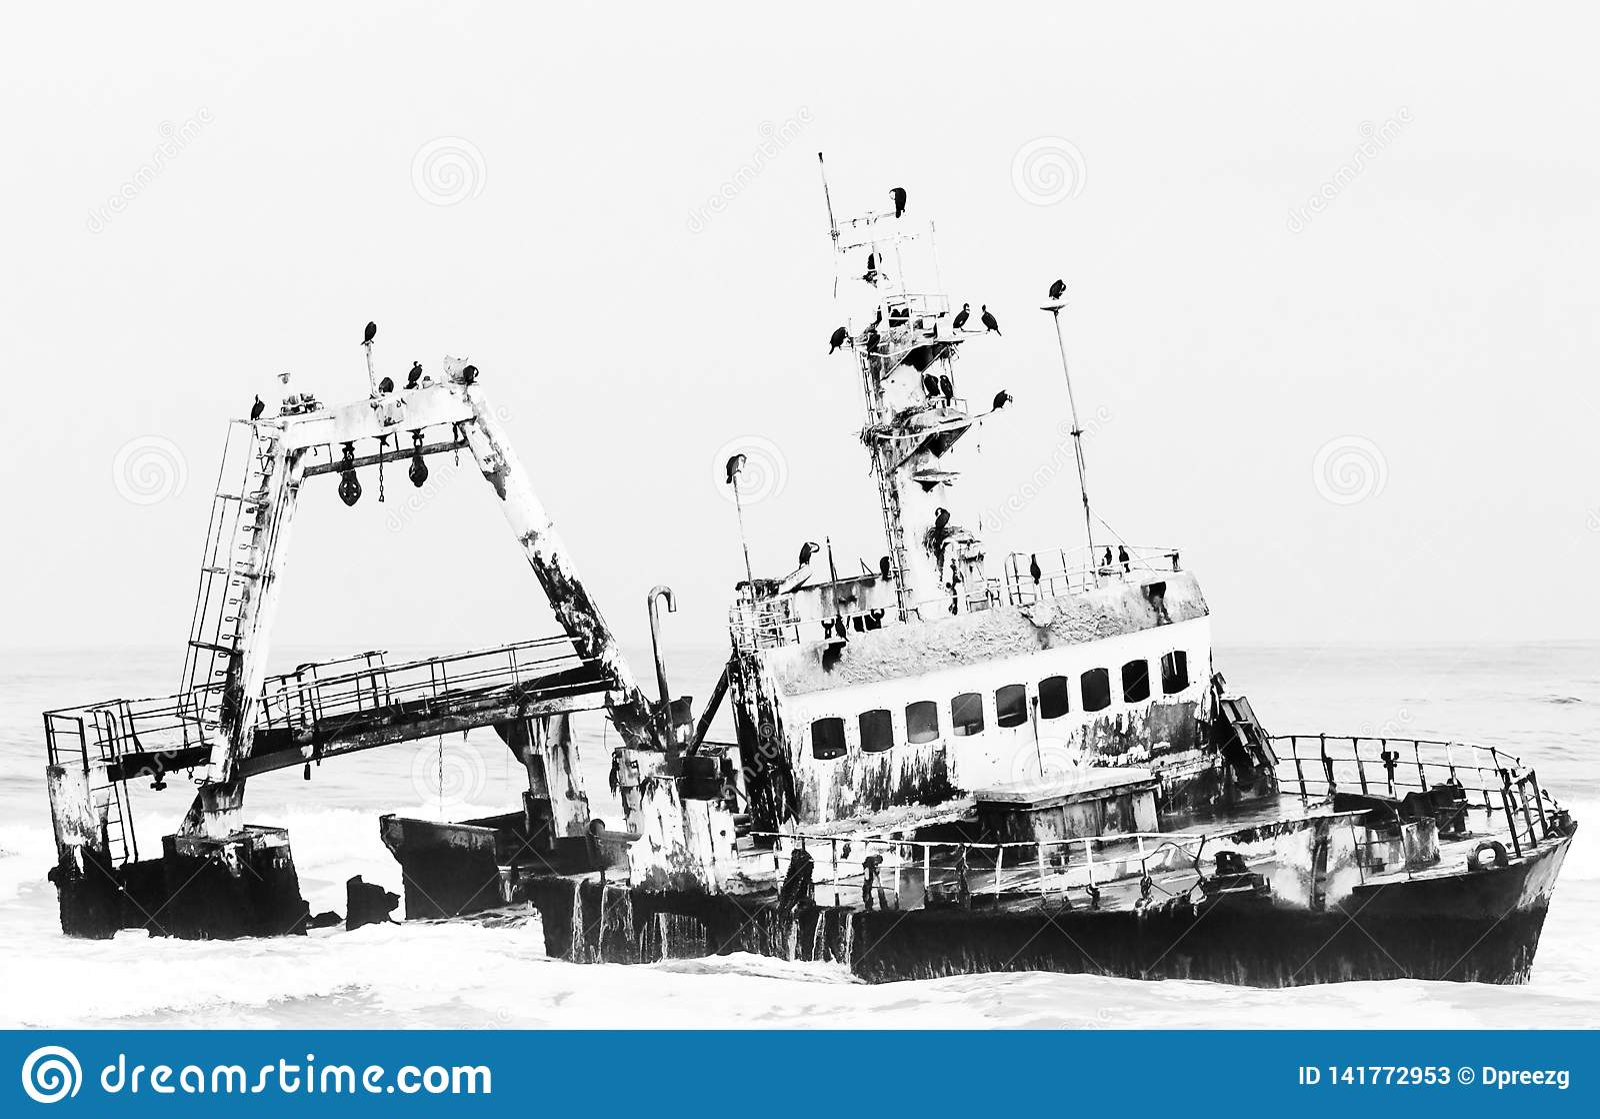 Shipwreck of the Zeila near Henties Bay. Monochrome